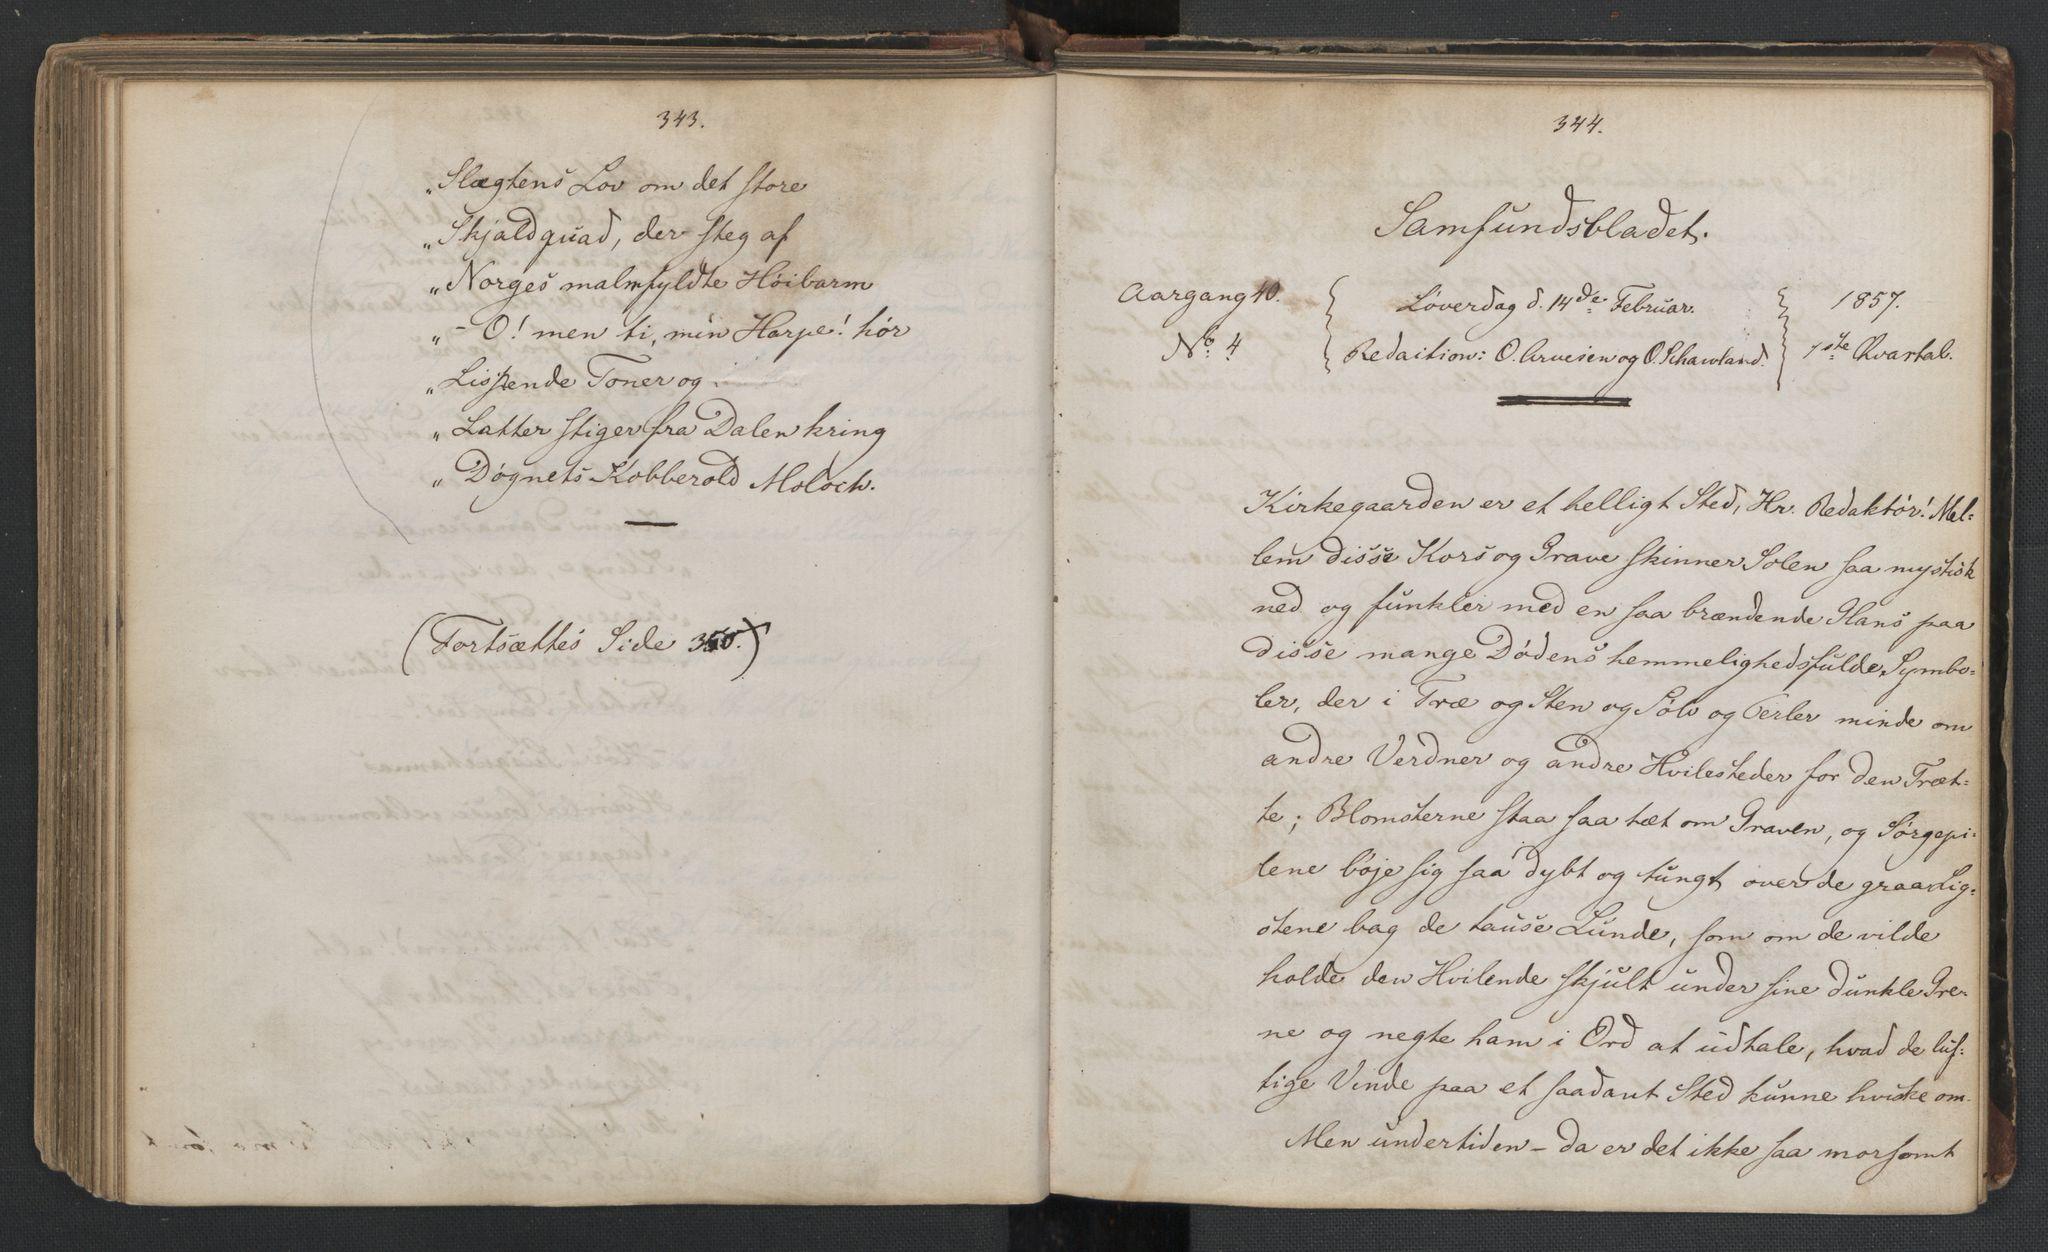 RA, Det Norske Studentersamfund, X/Xa/L0006, 1856-1857, s. 176